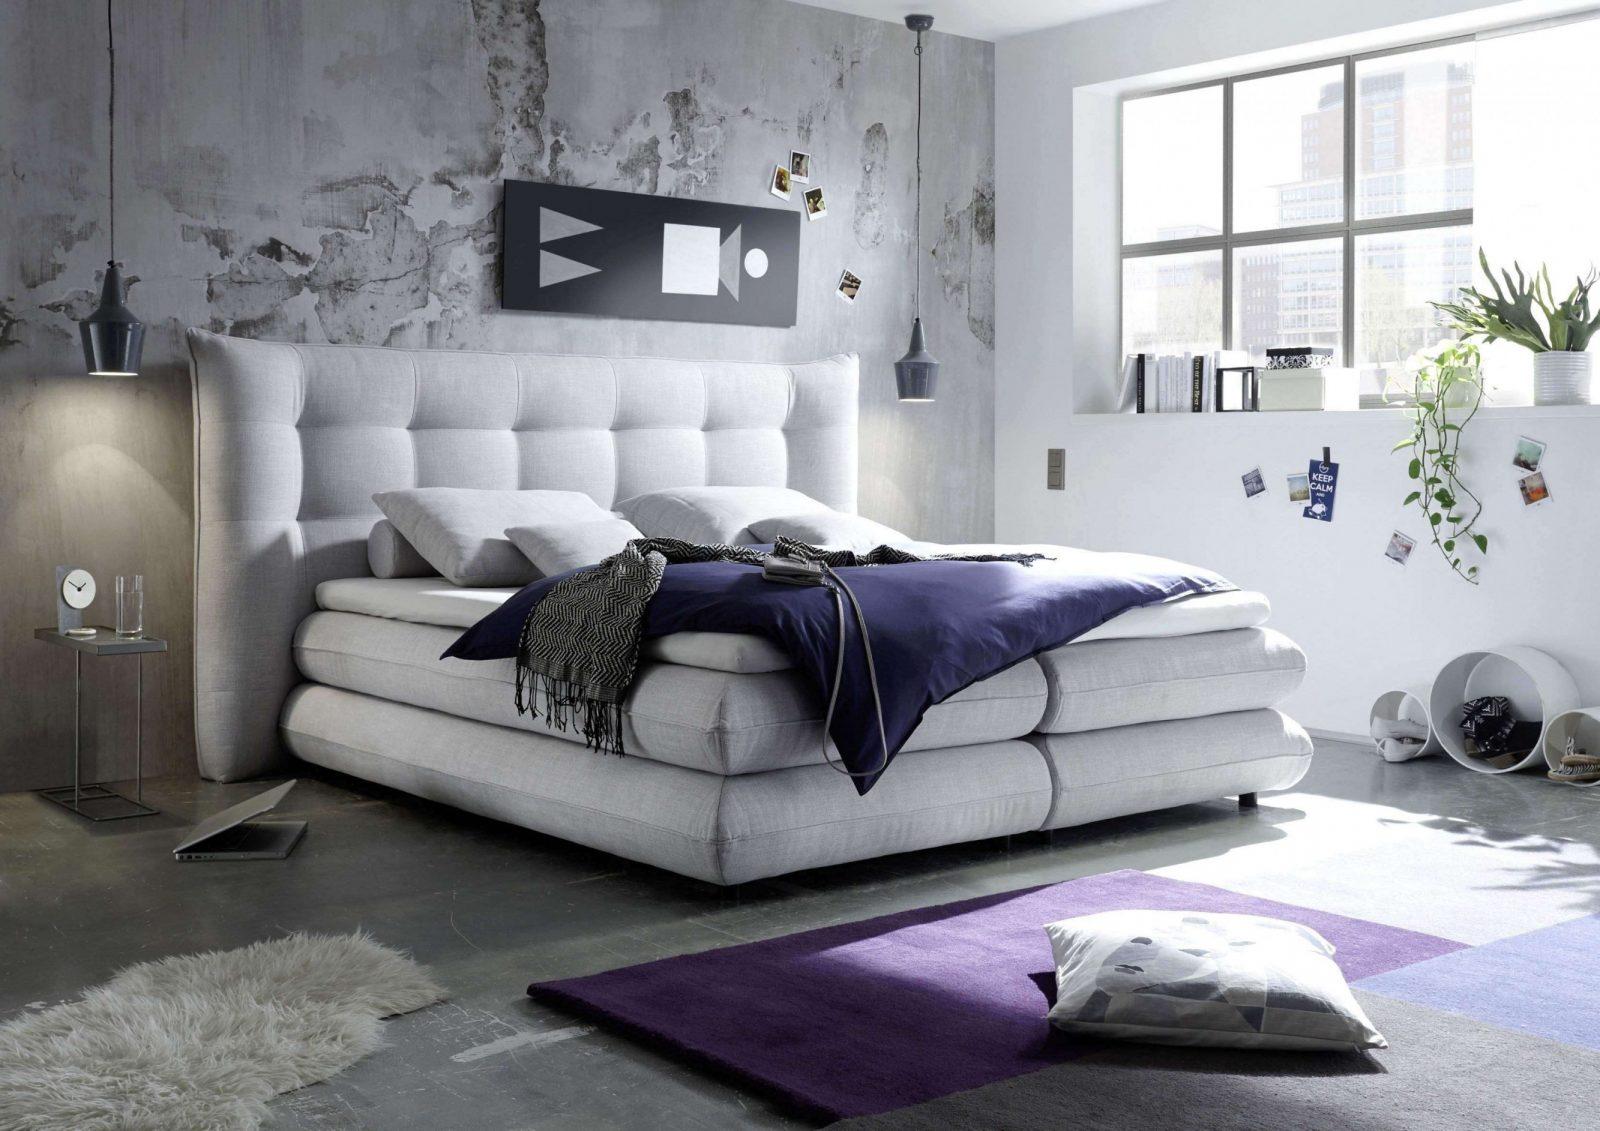 Luxus Komplett Schlafzimmer Boxspringbett Designideen  All von Schlafzimmer Ideen Mit Boxspringbett Bild